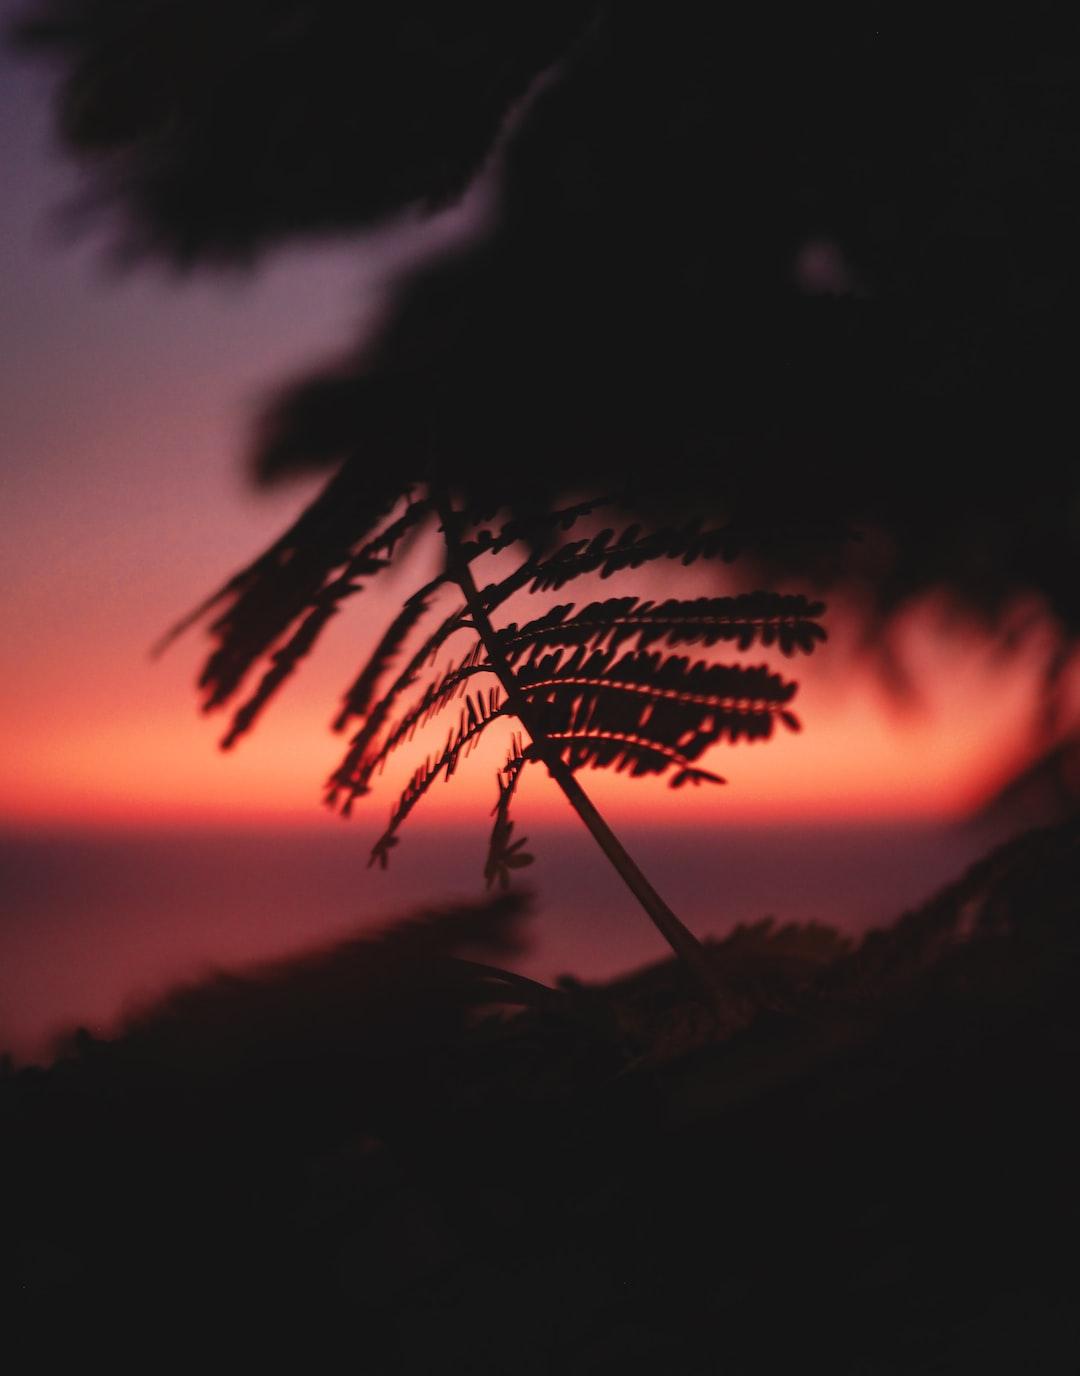 enjoy this vibe. - blurry leaf, sunset